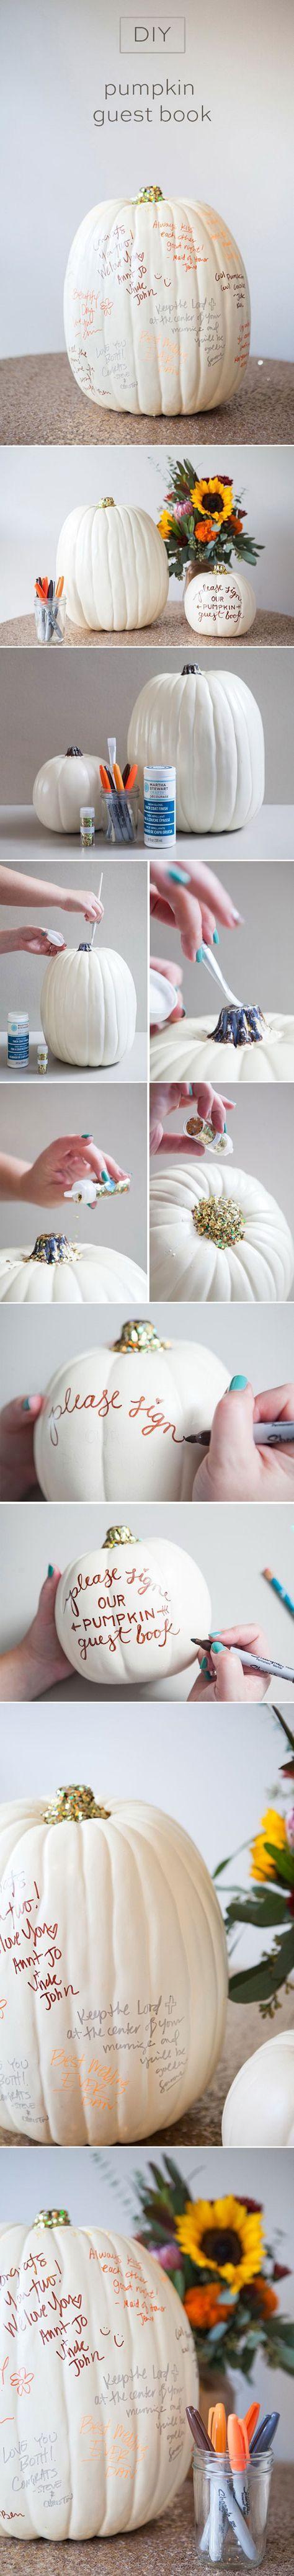 Diy halloween wedding decorations   DIY Halloween Wedding Decoration Ideas with Pumpkins  One year